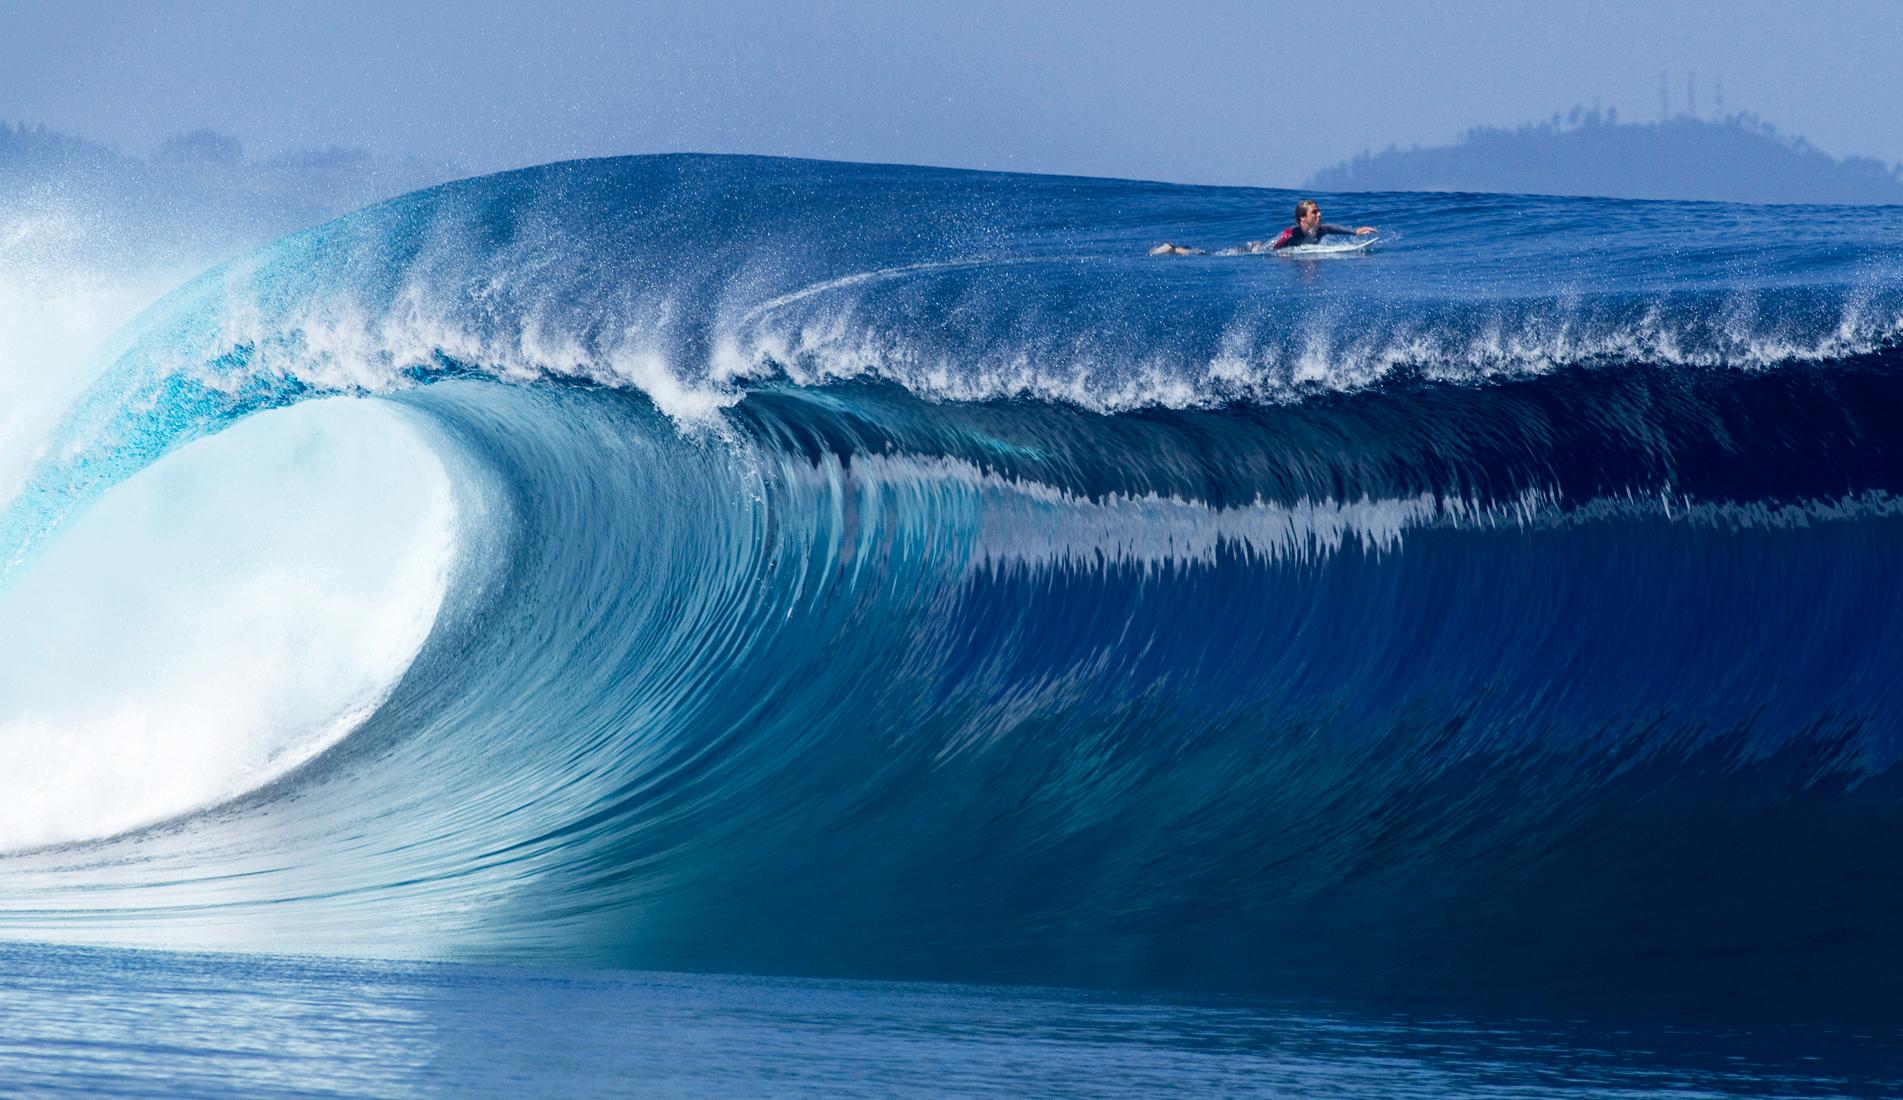 fotos-adrenalina-watersports-7